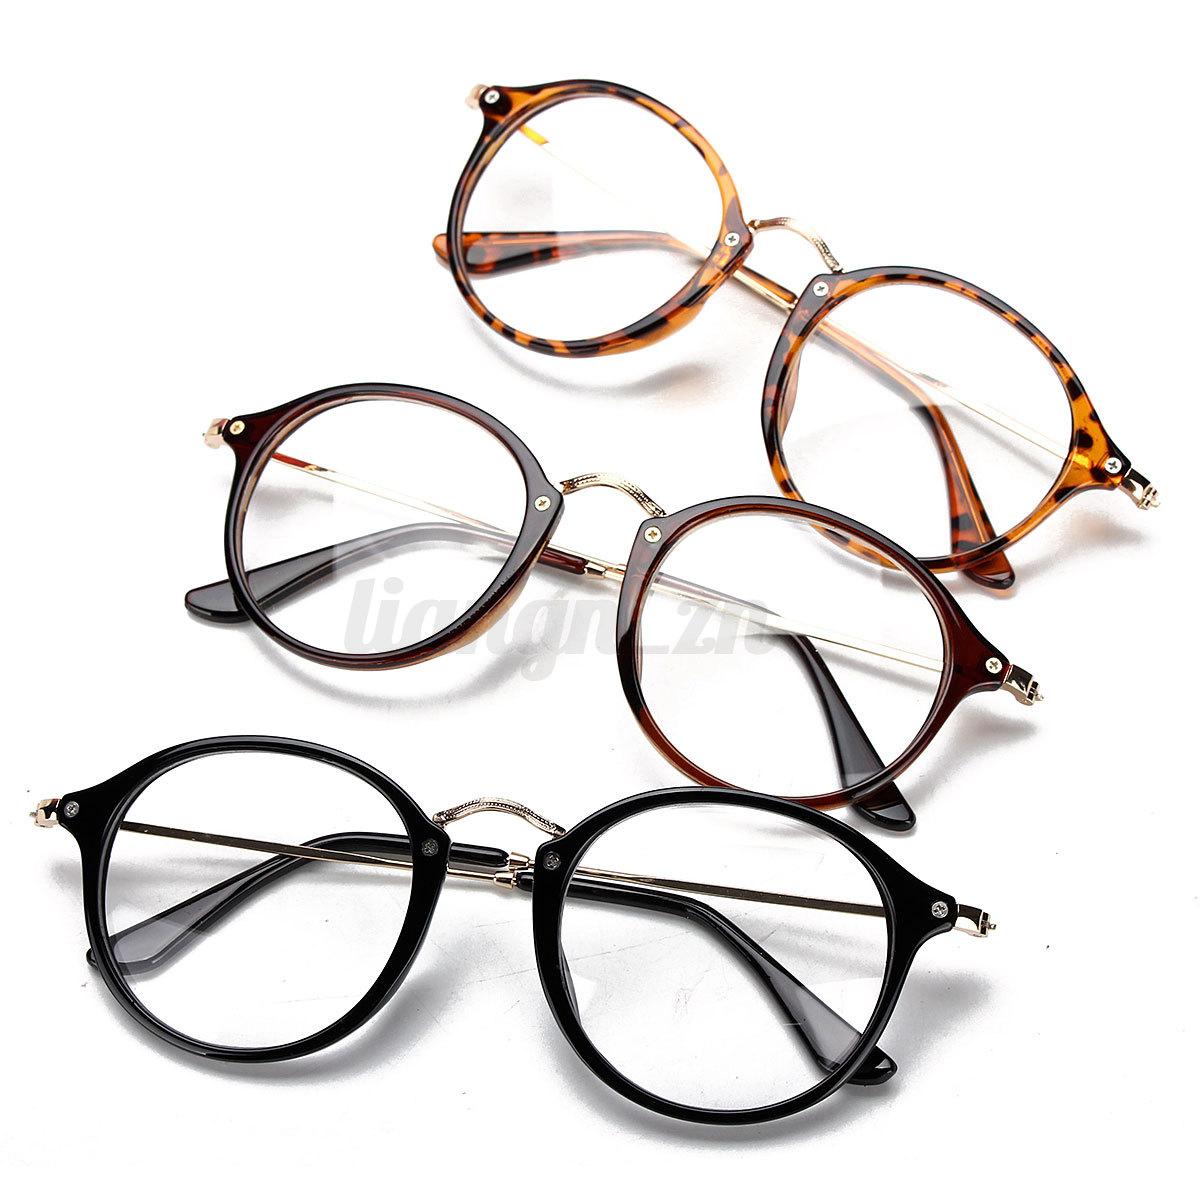 lunette loupe de lecture vue monture rondes m tal vintage unisex homme femme ebay. Black Bedroom Furniture Sets. Home Design Ideas